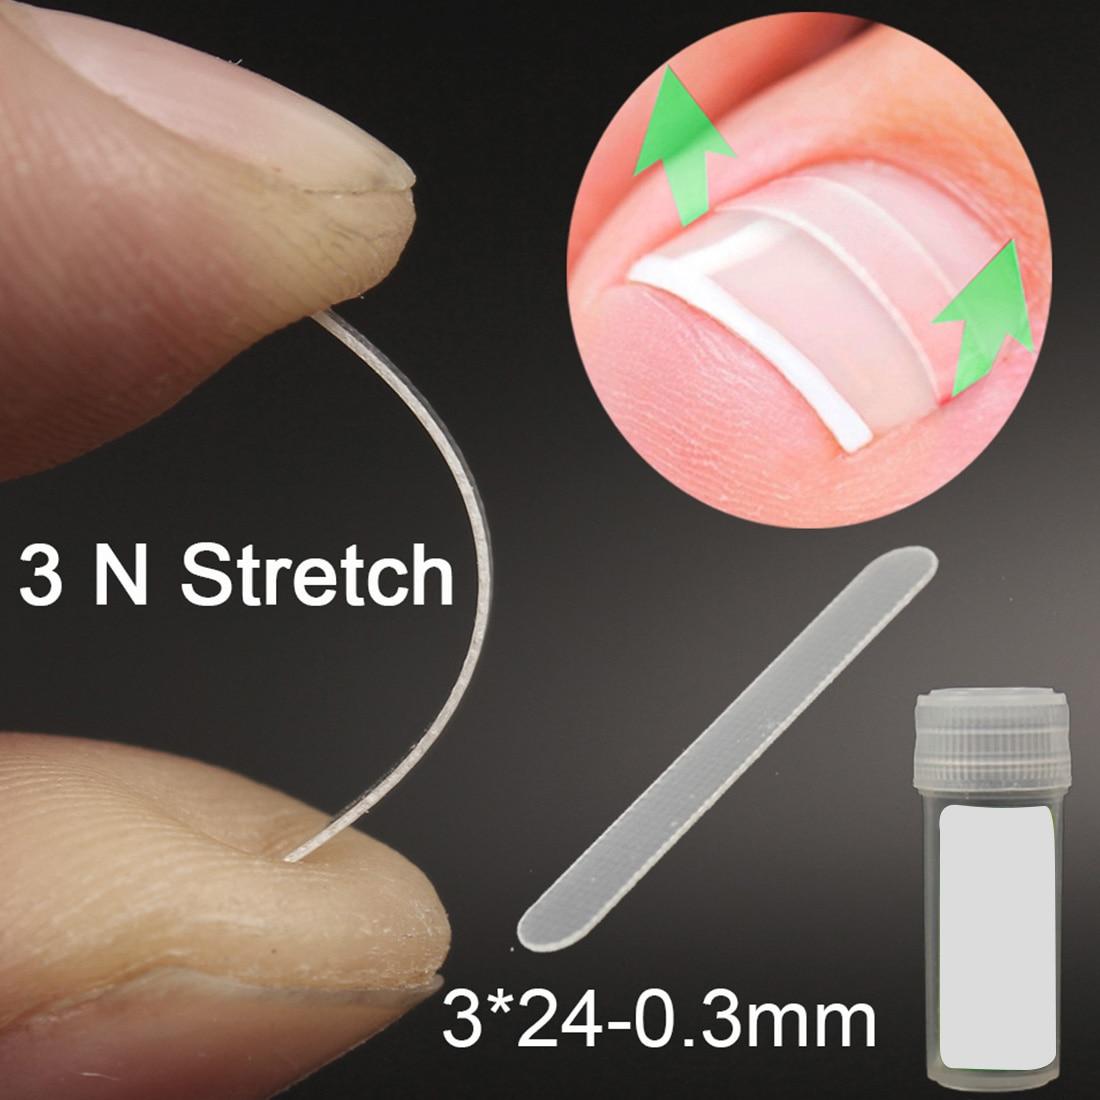 10pcs Ingrown Toenail Correction Tool Ingrown Toe Nail Treatment Elastic Patch Sticker Straightening Clip Brace Pedicure Tool MINI